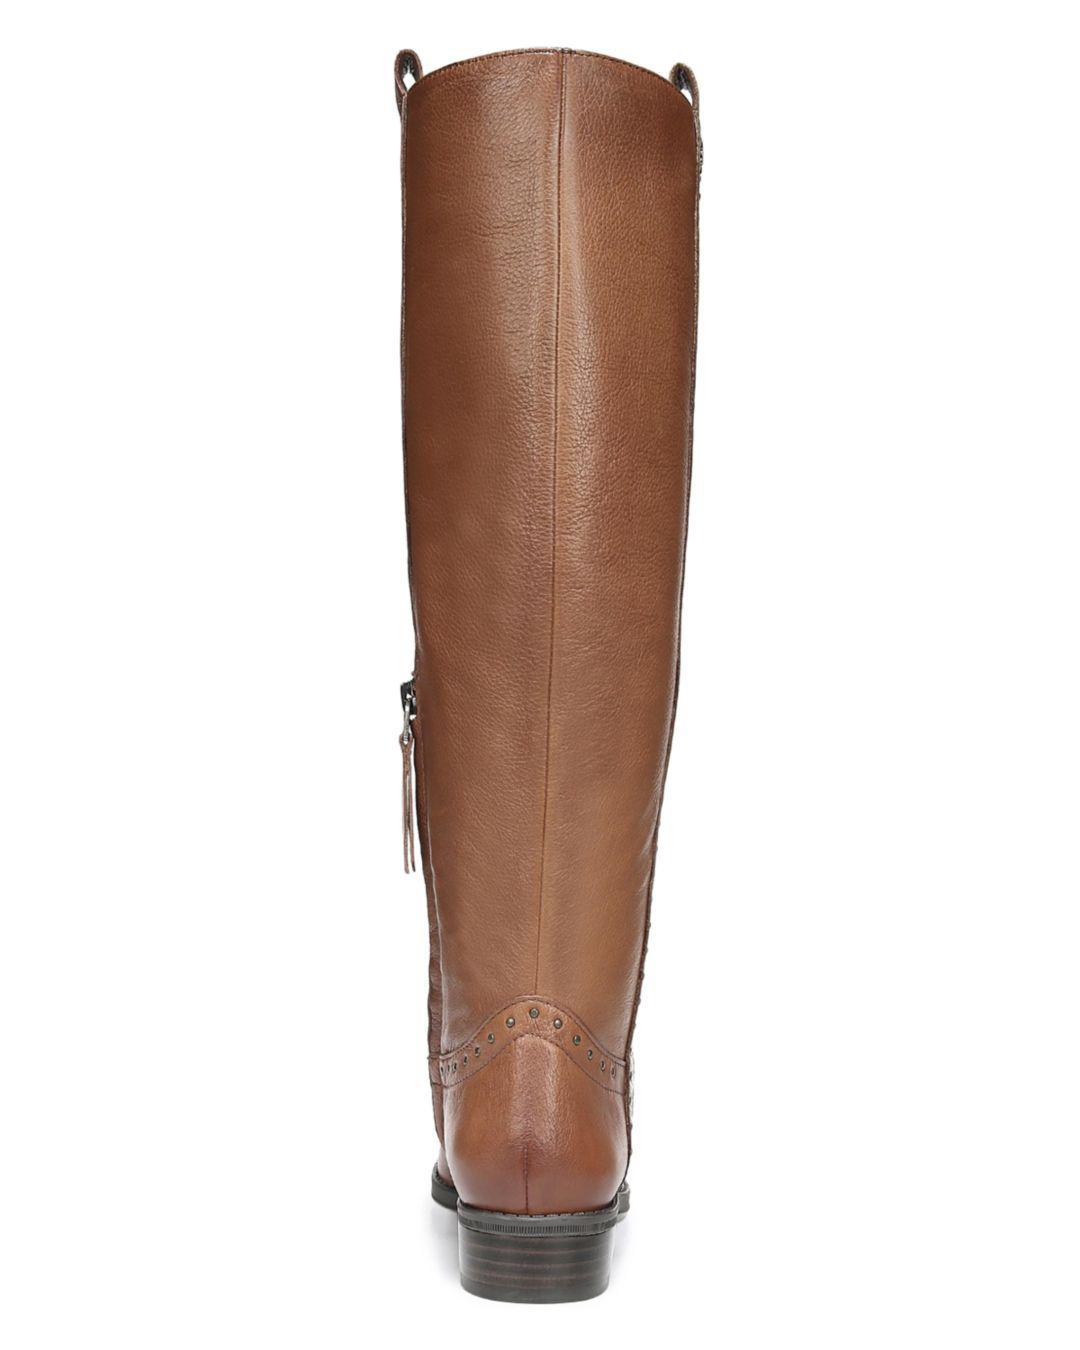 9c98e6a09cb8 Sam Edelman - Brown Women s Prina Round Toe Tall Leather Boots - Lyst. View  fullscreen